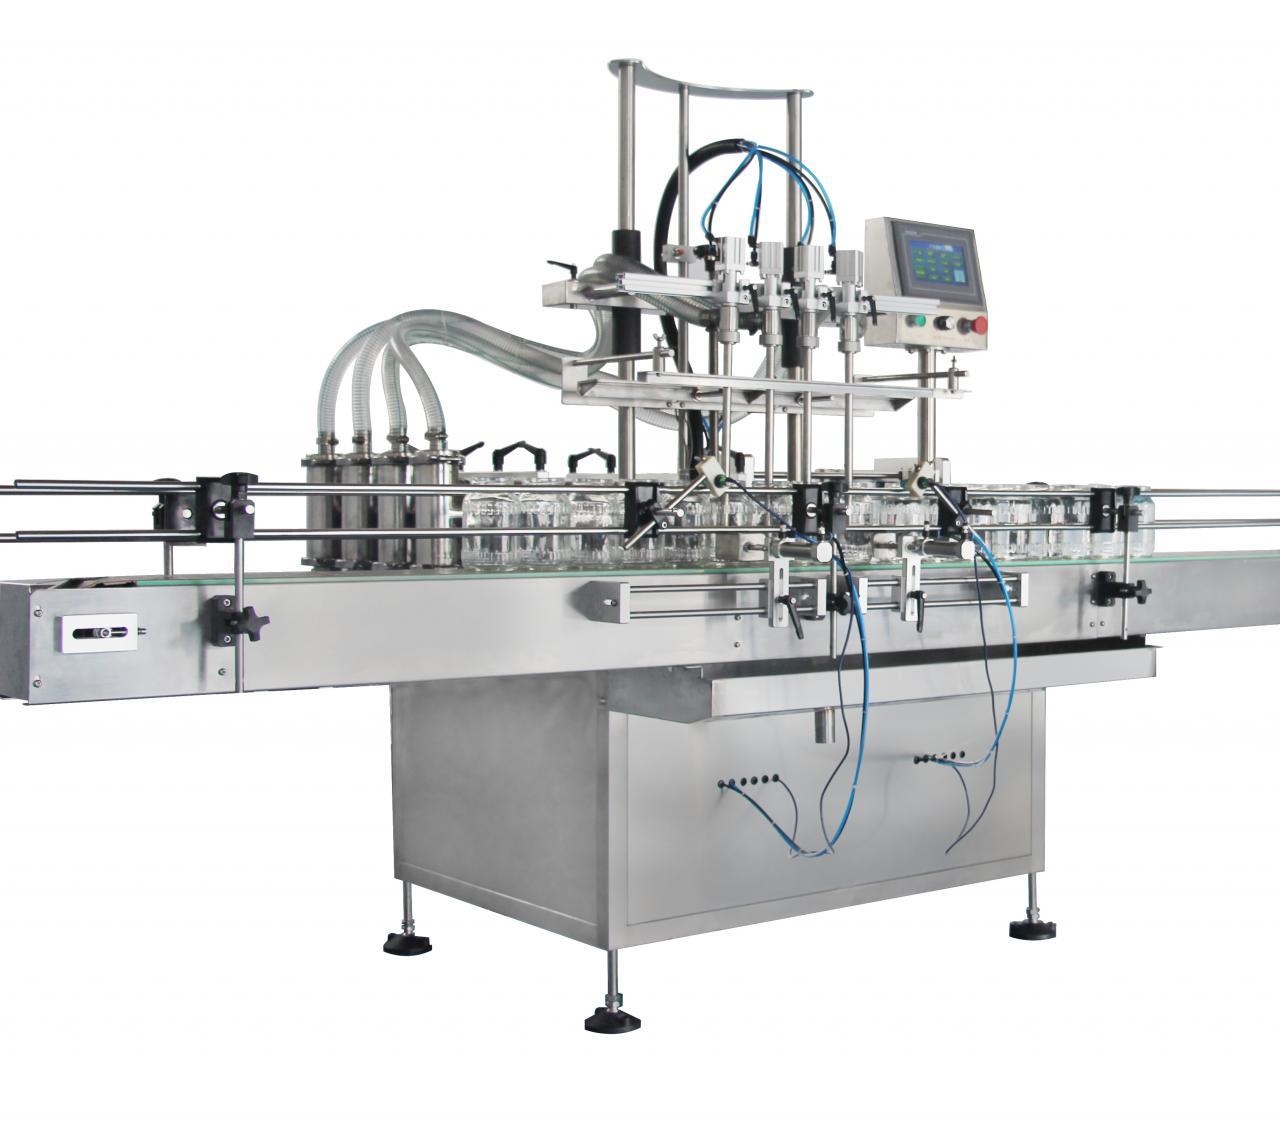 Npack Servo Motor Economic Piston Linear Type NP-EVF High Speed Automatic Liquid Bottle Filling Machine